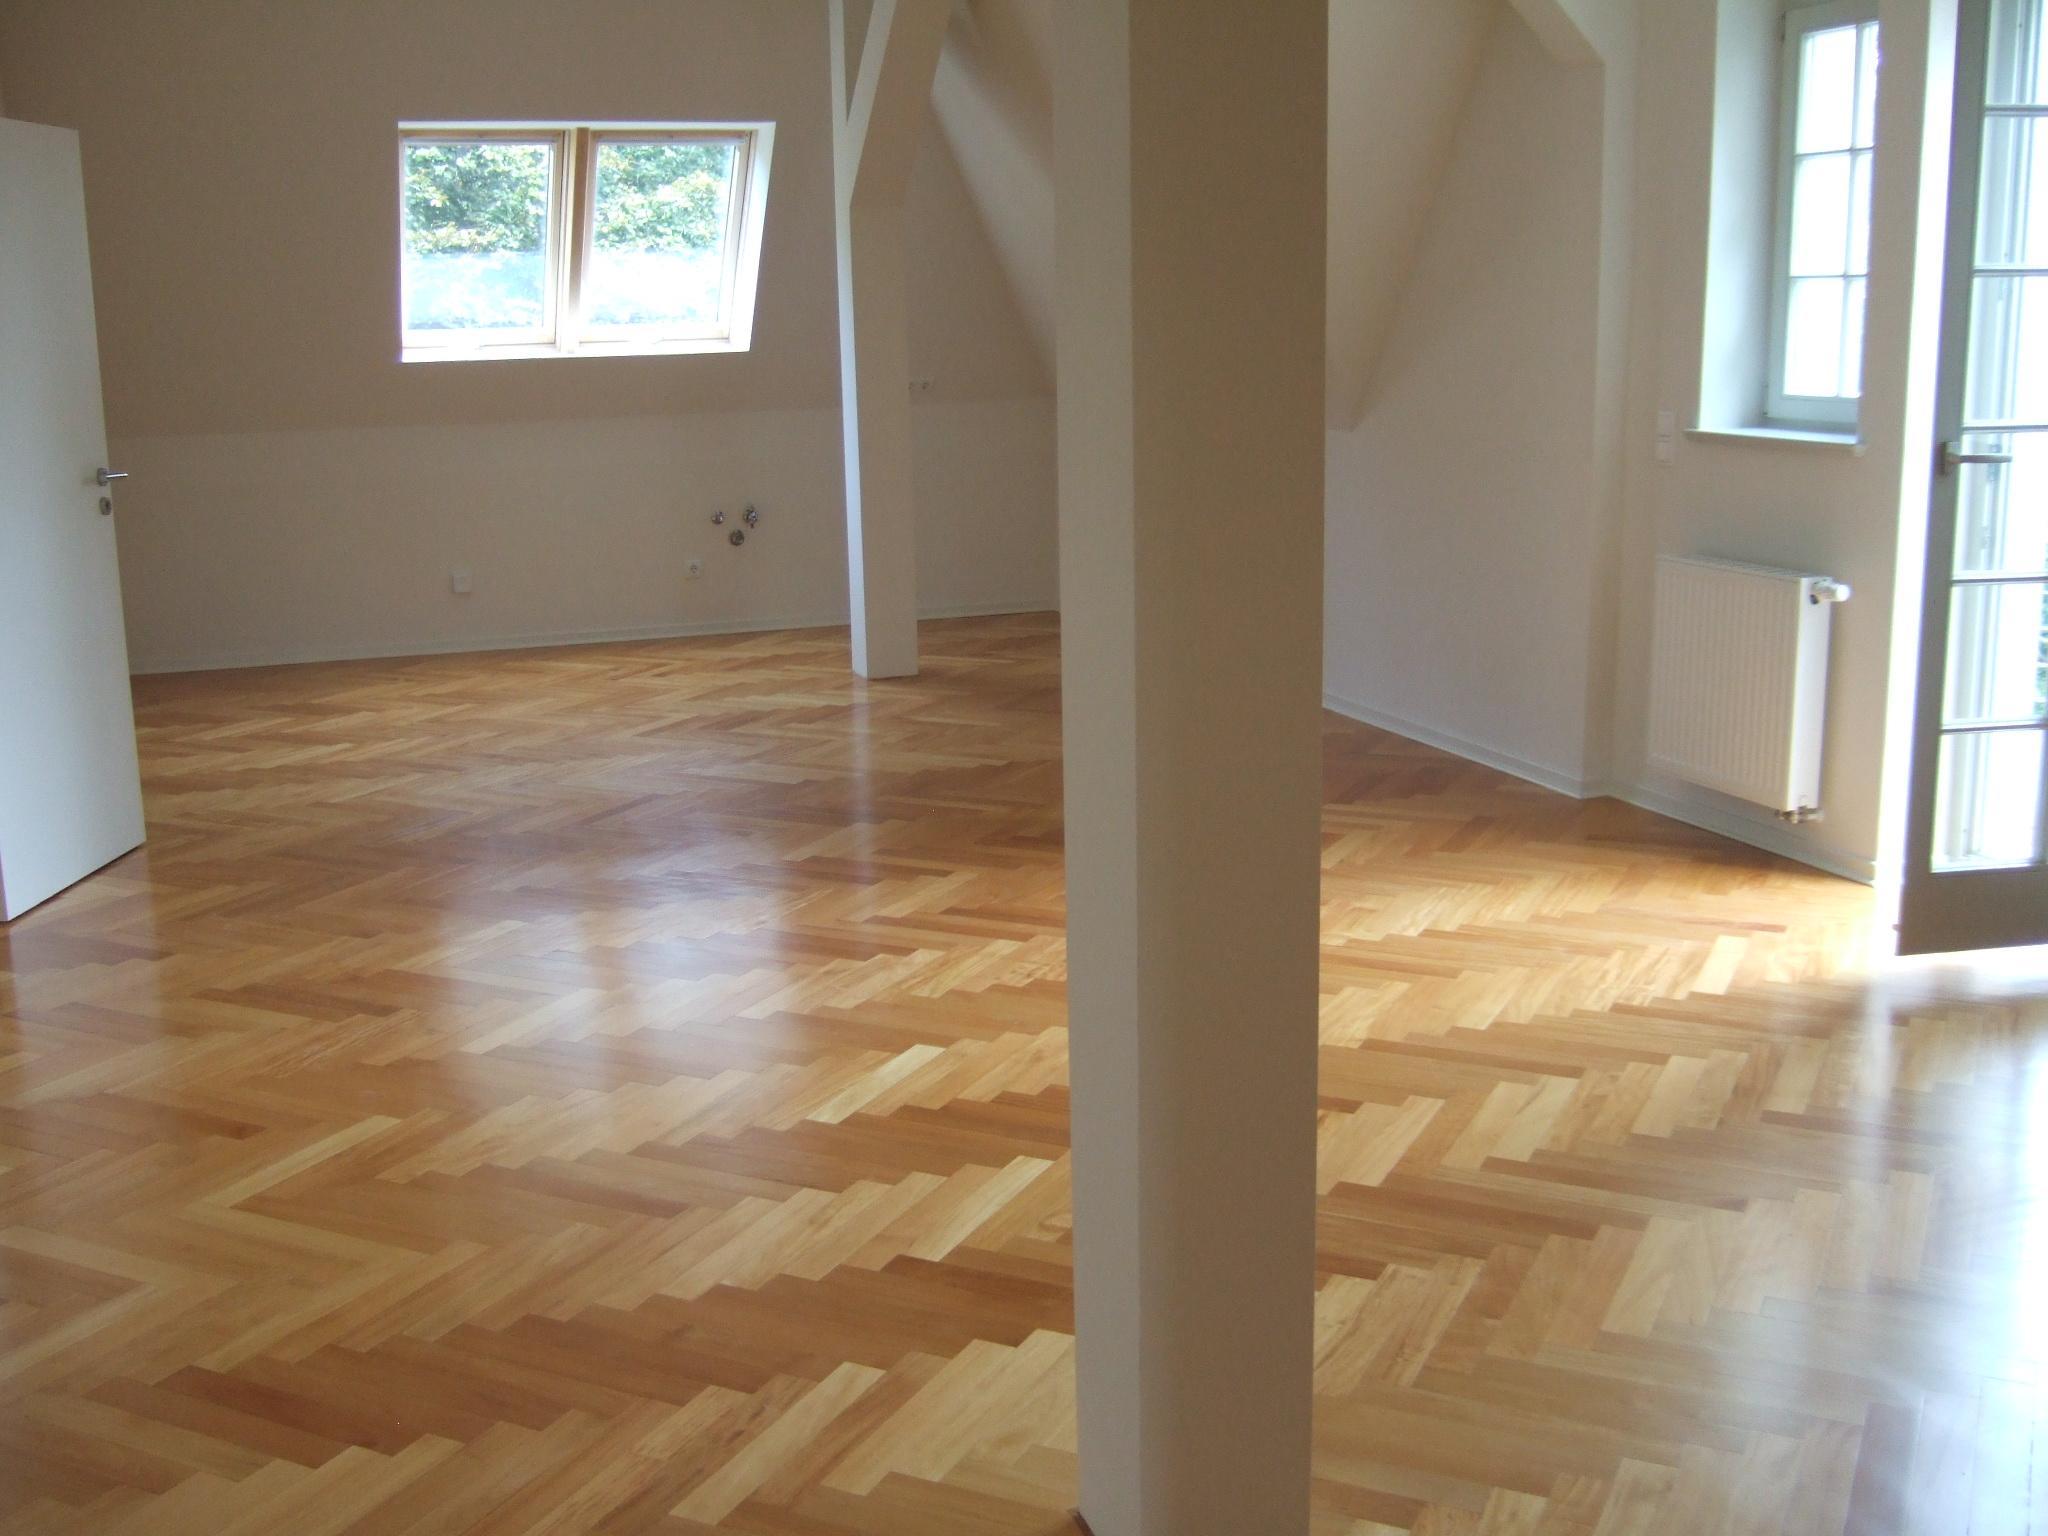 admiralswohnung parkett fischgr t. Black Bedroom Furniture Sets. Home Design Ideas